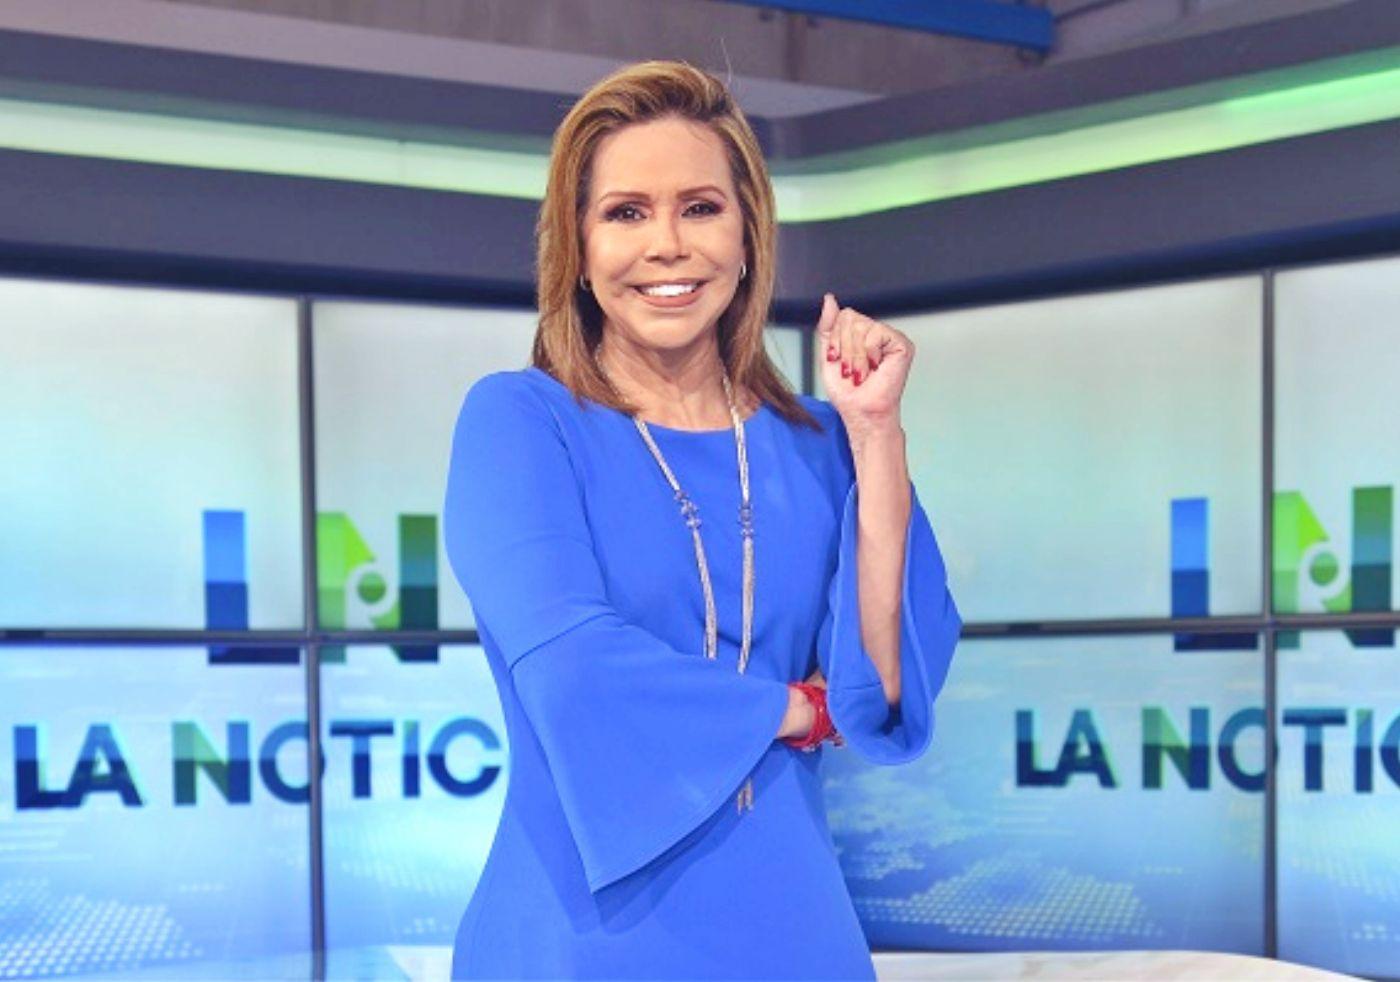 La periodista de RTS, Luisa Delgadillo, positivo para COVID-19